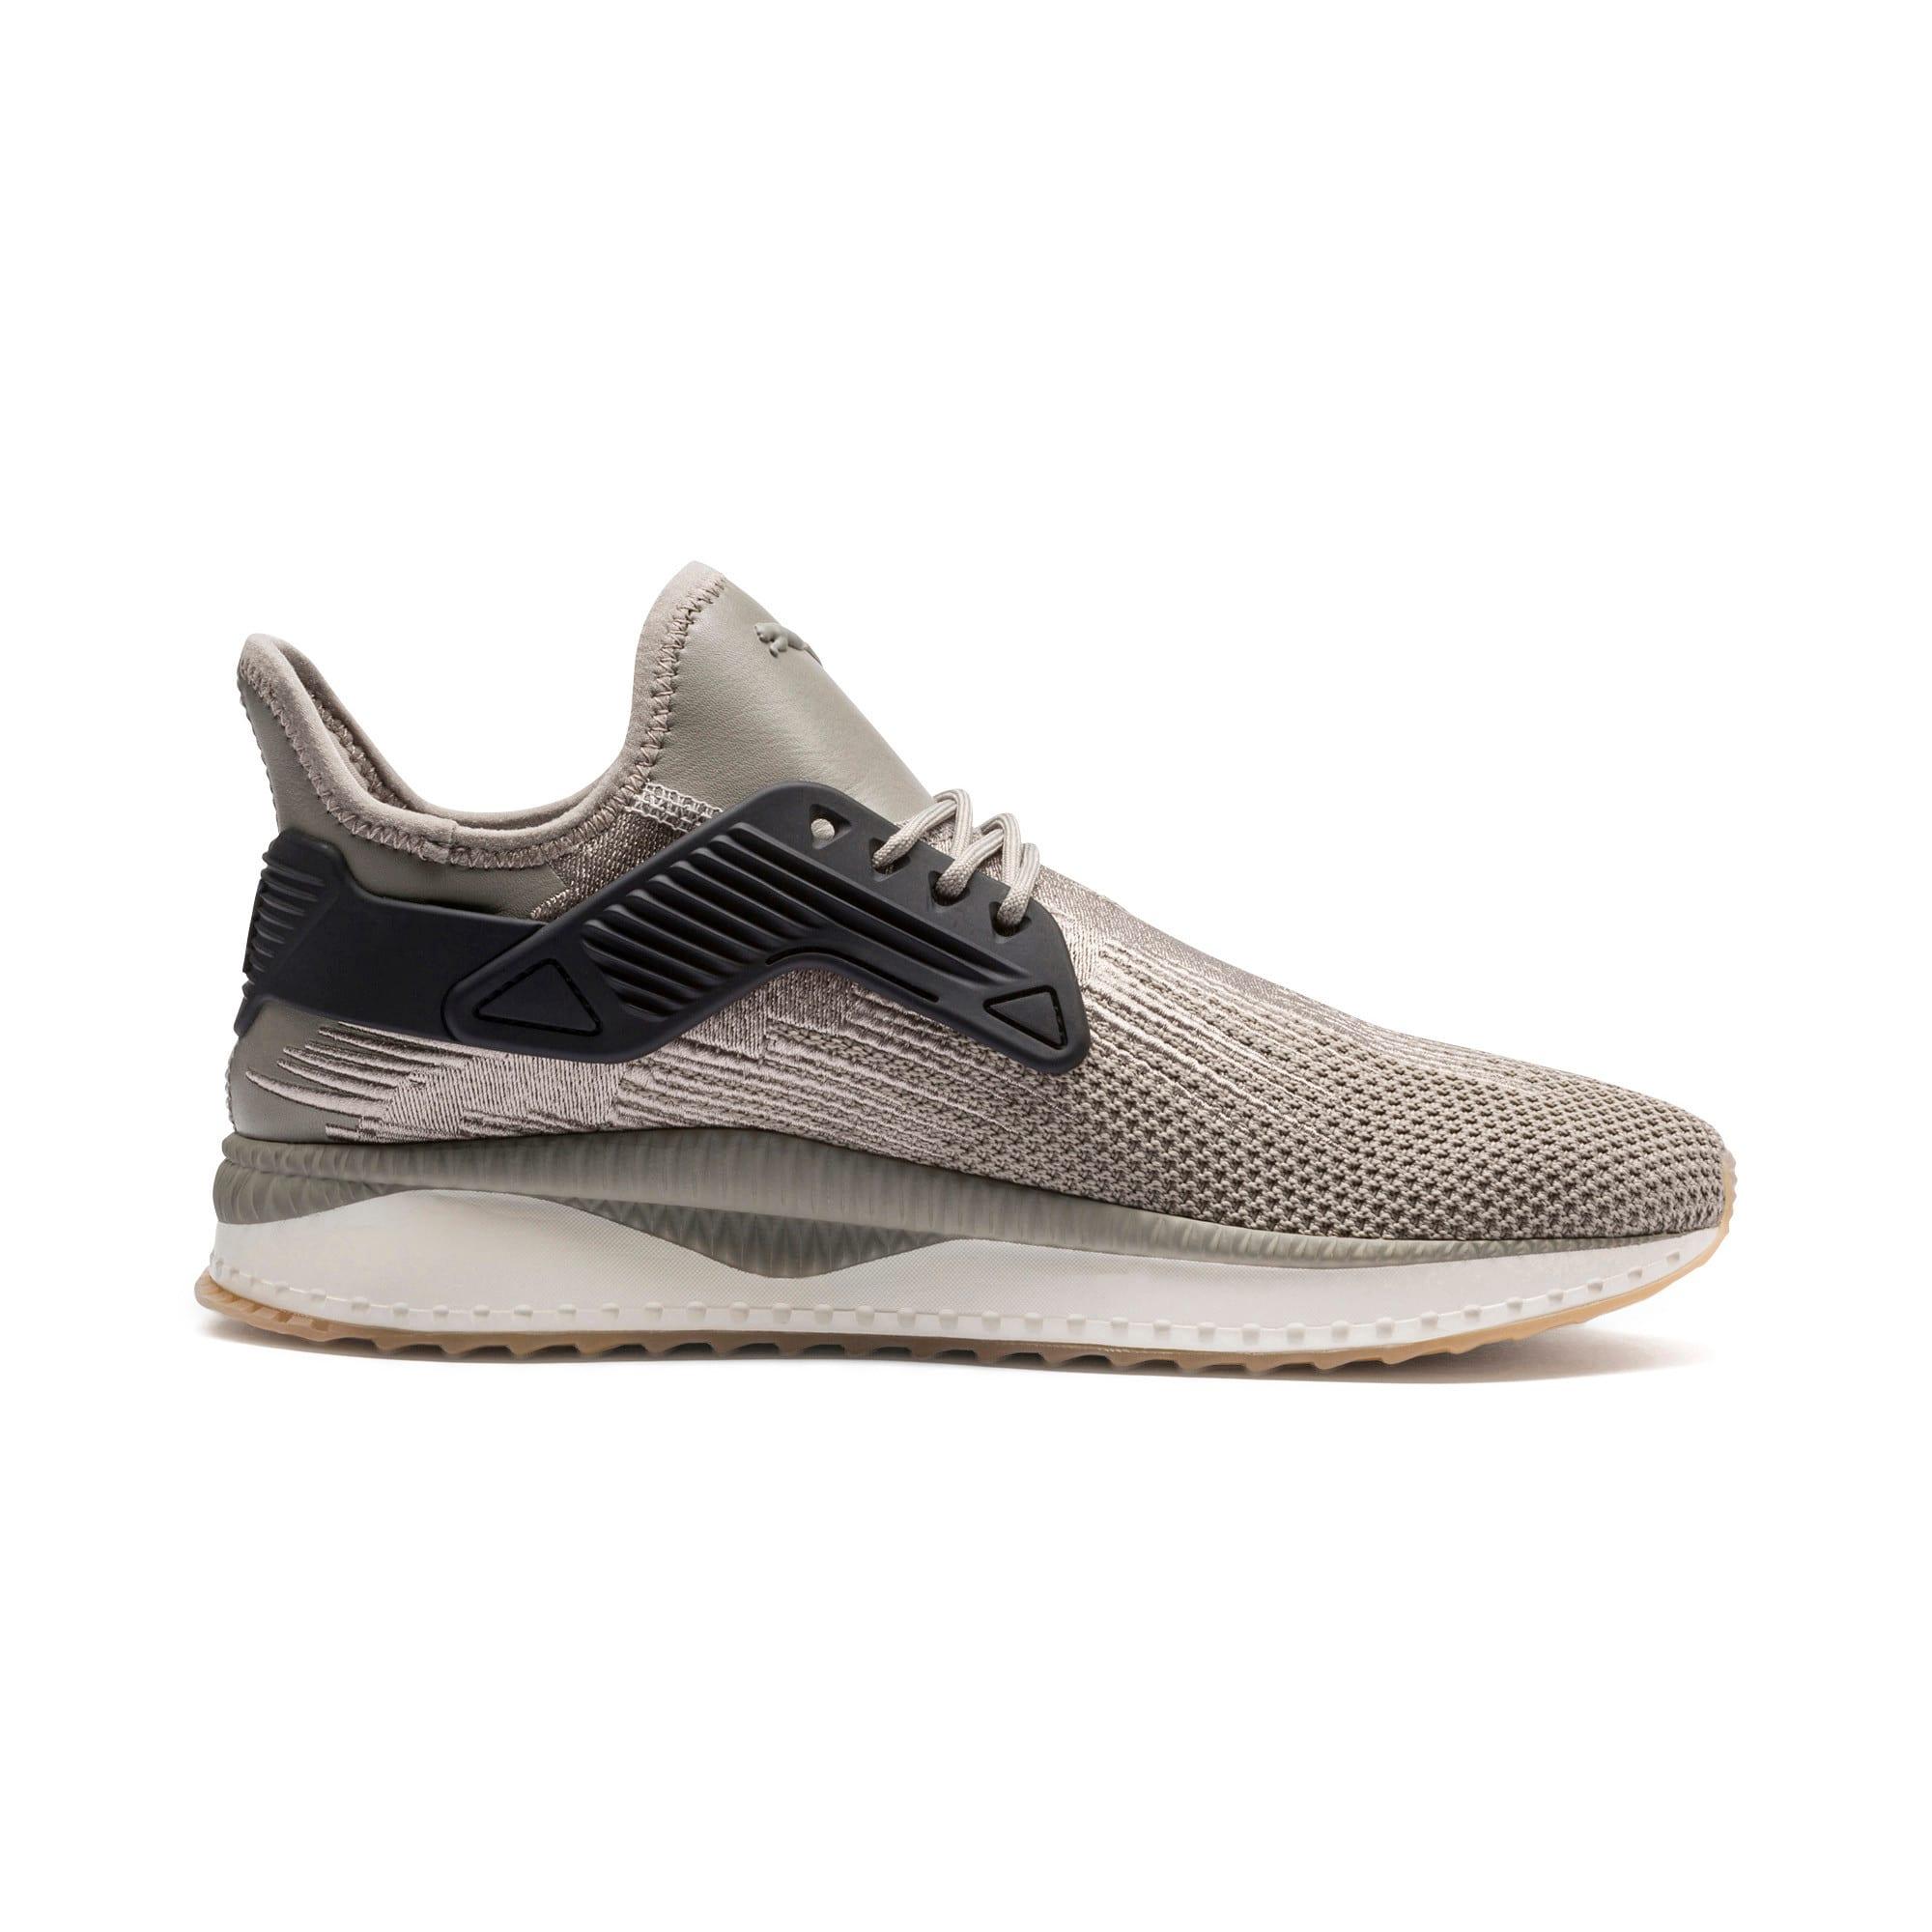 Thumbnail 5 of TSUGI Cage Premium Sneakers, Elephant Skin-Puma Black, medium